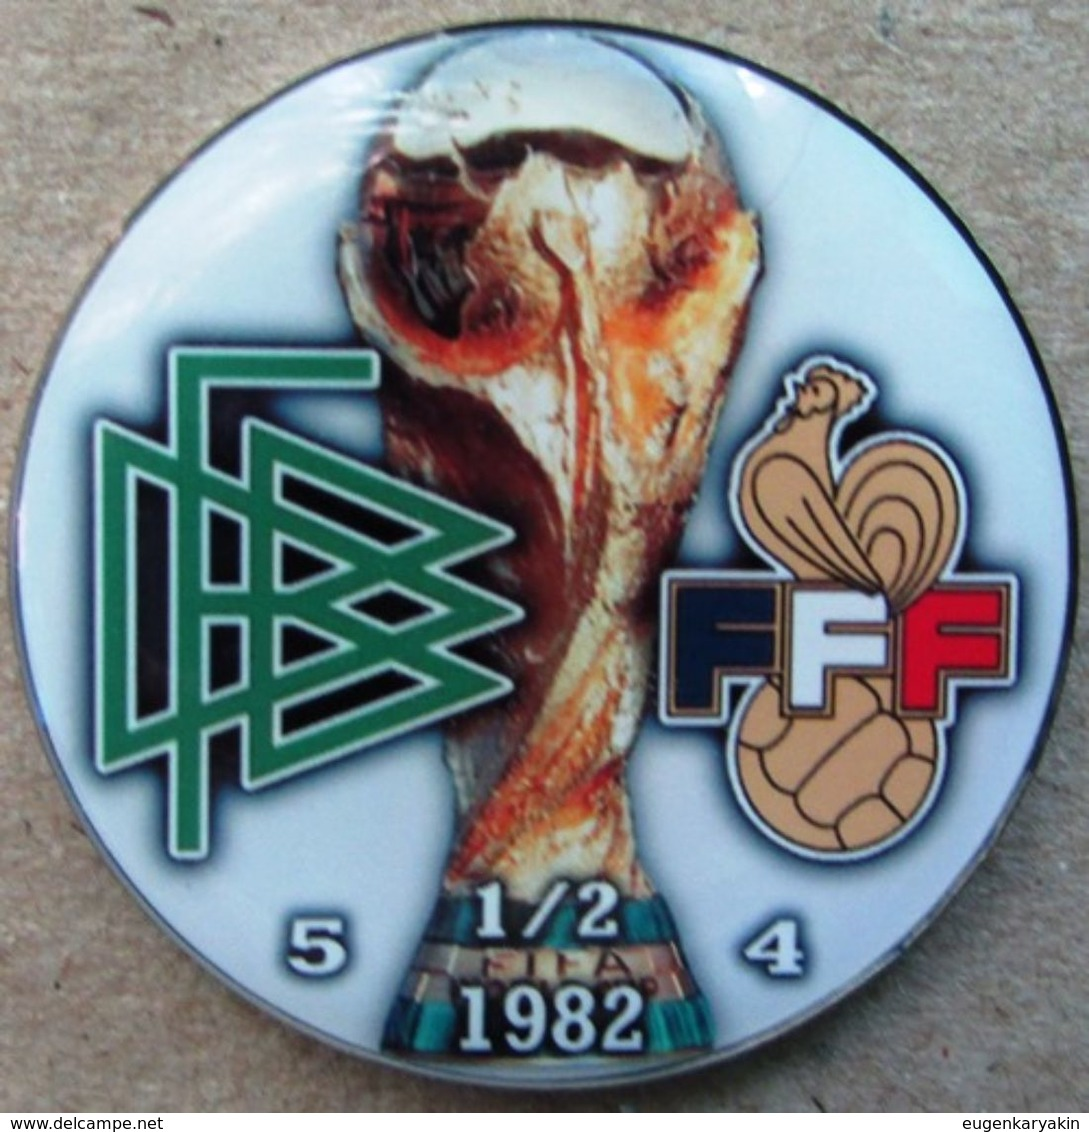 Pin FIFA World Cup 1982 1/2 Final Germany Vs France - Fussball